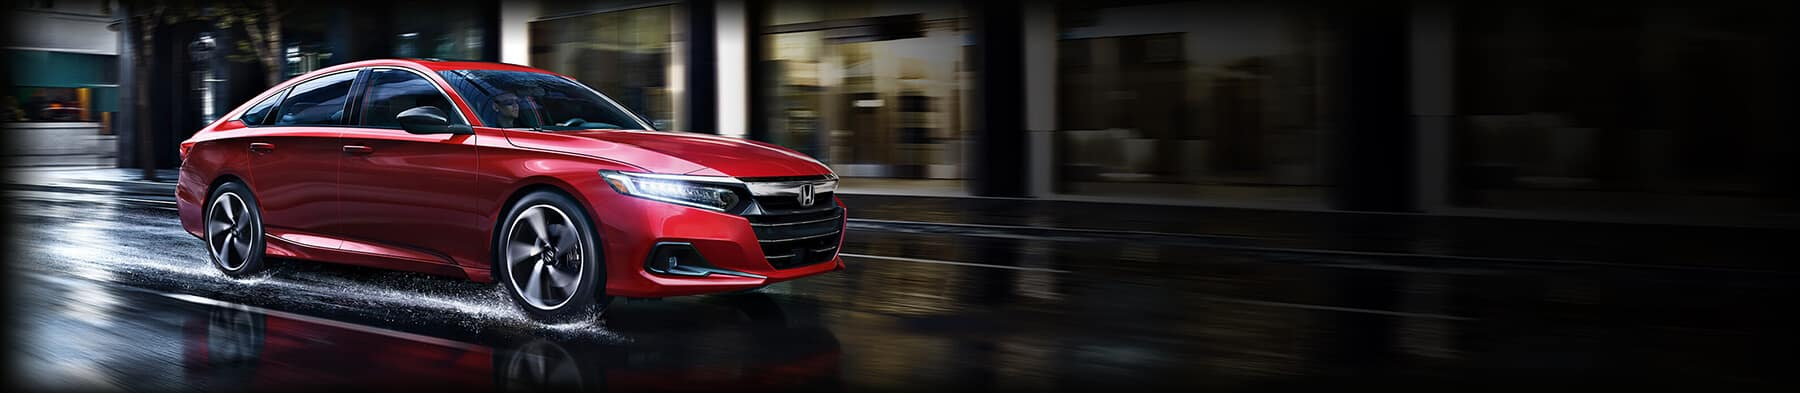 Honda Accord Awards Hero Image